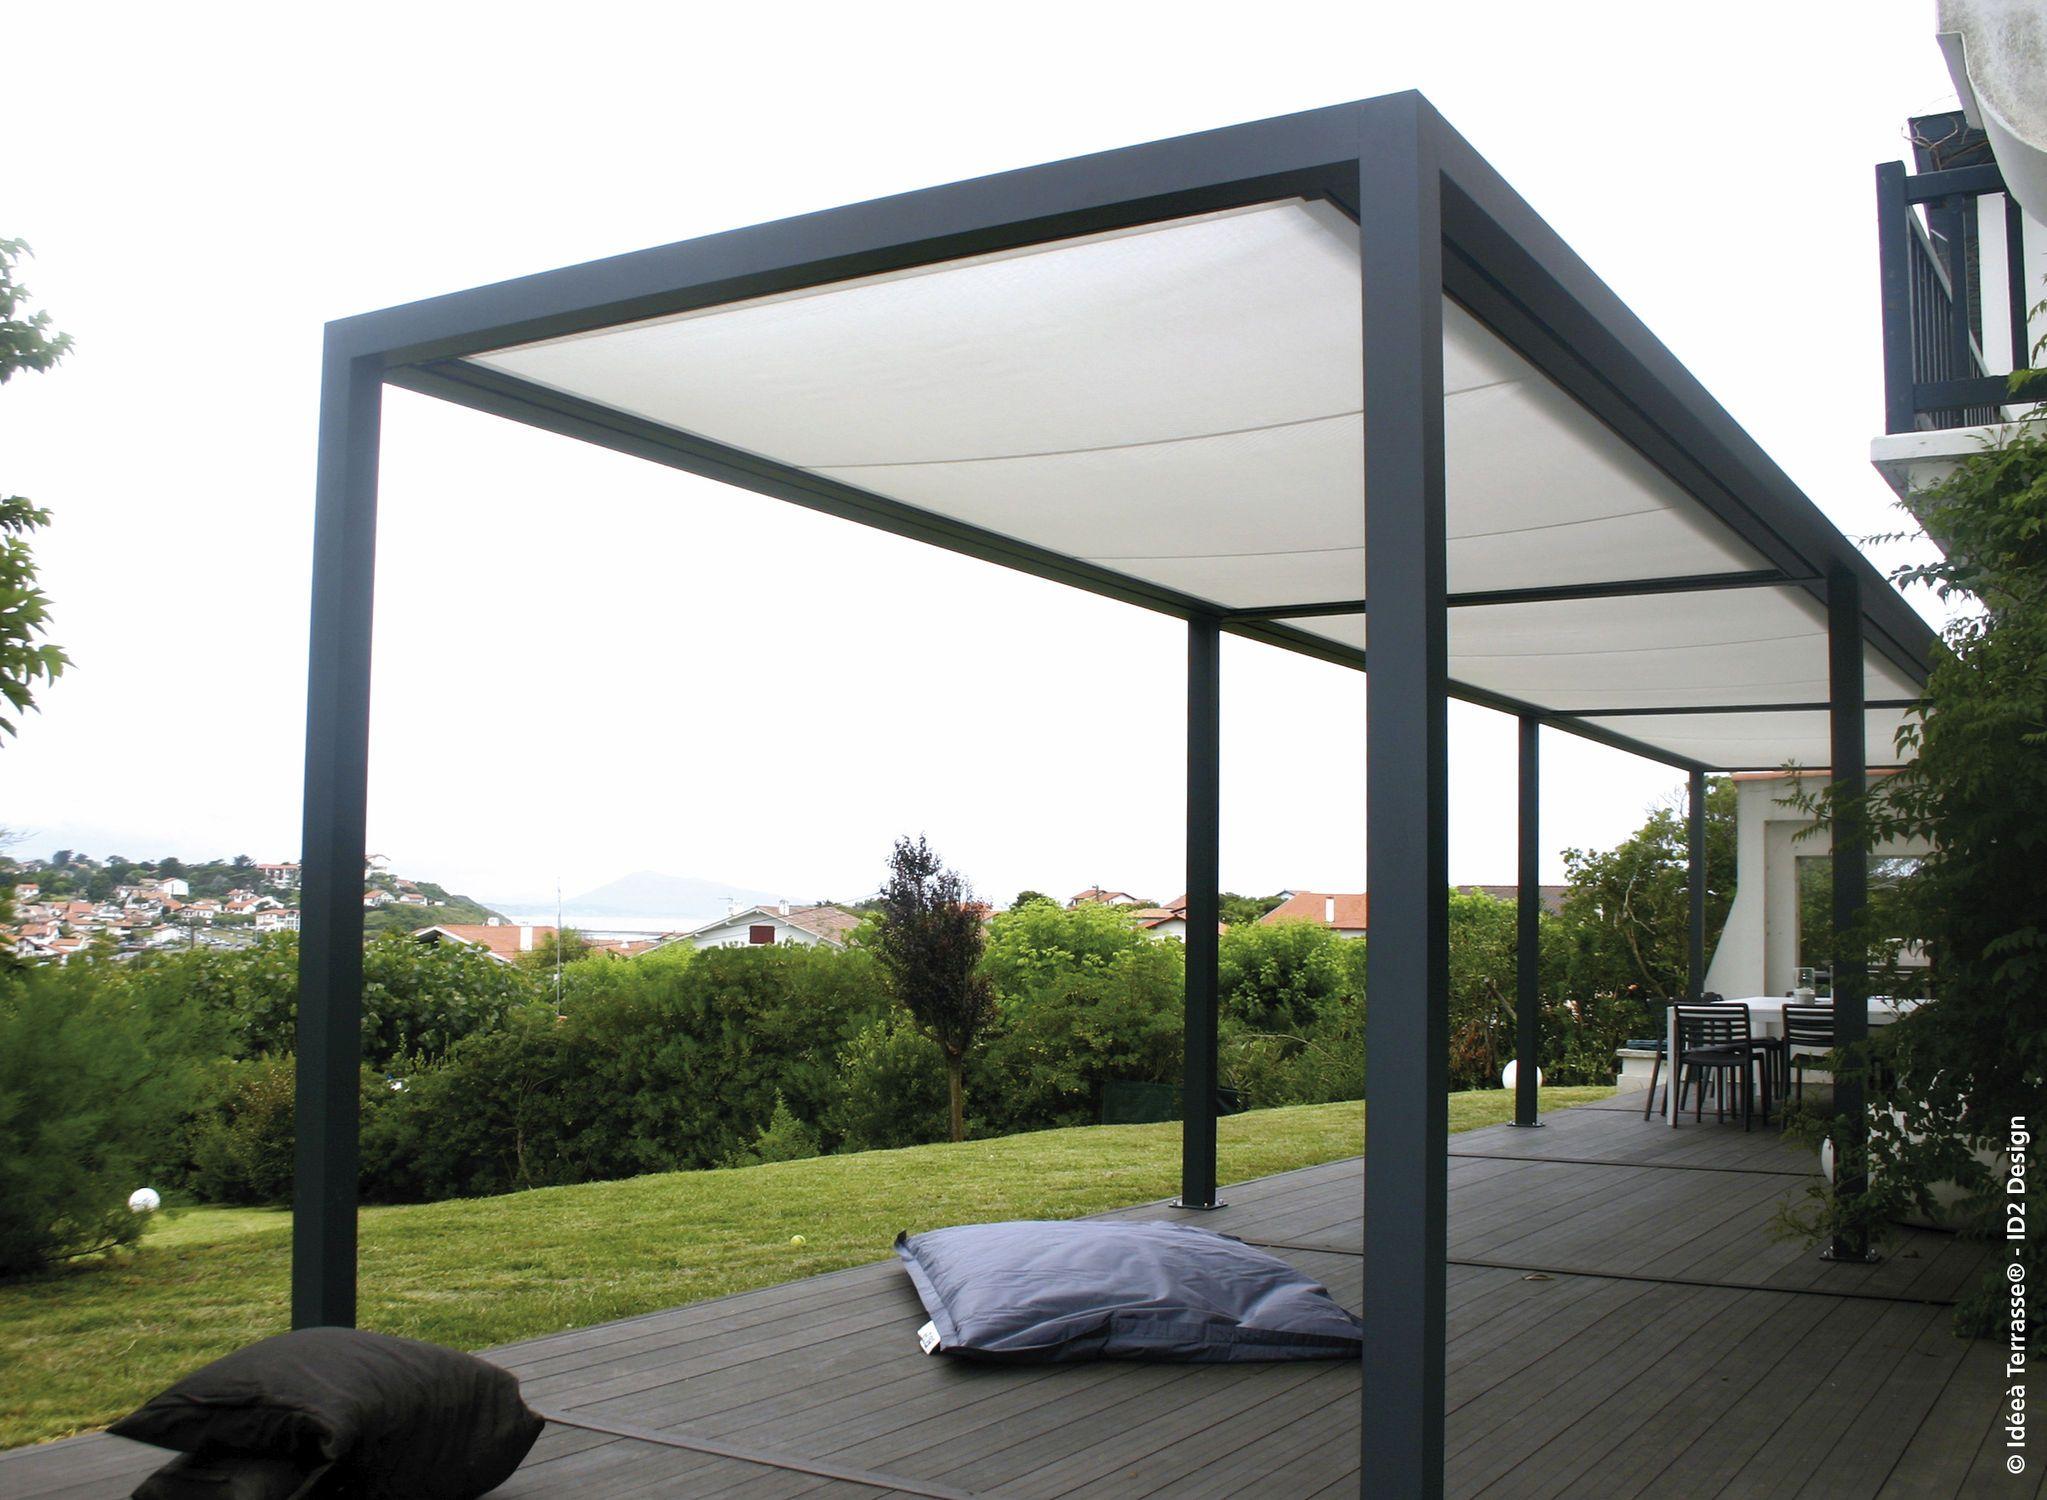 modular freestanding aluminium pergola custom made 58007 2047 1500 penthouse. Black Bedroom Furniture Sets. Home Design Ideas